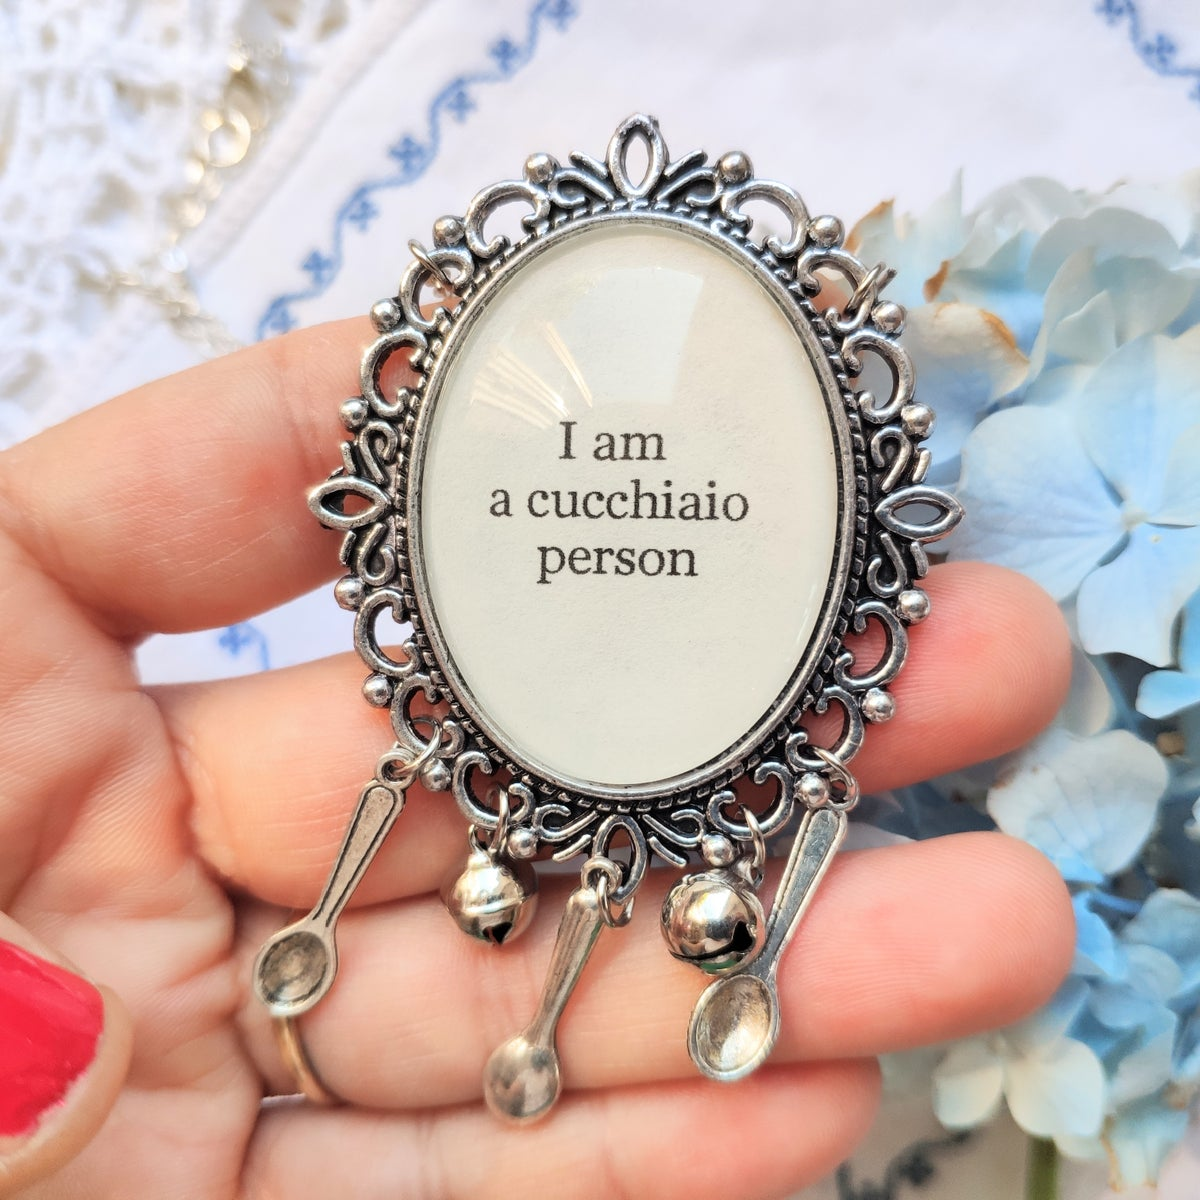 COLLANA - I AM A CUCCHIAIO PERSON